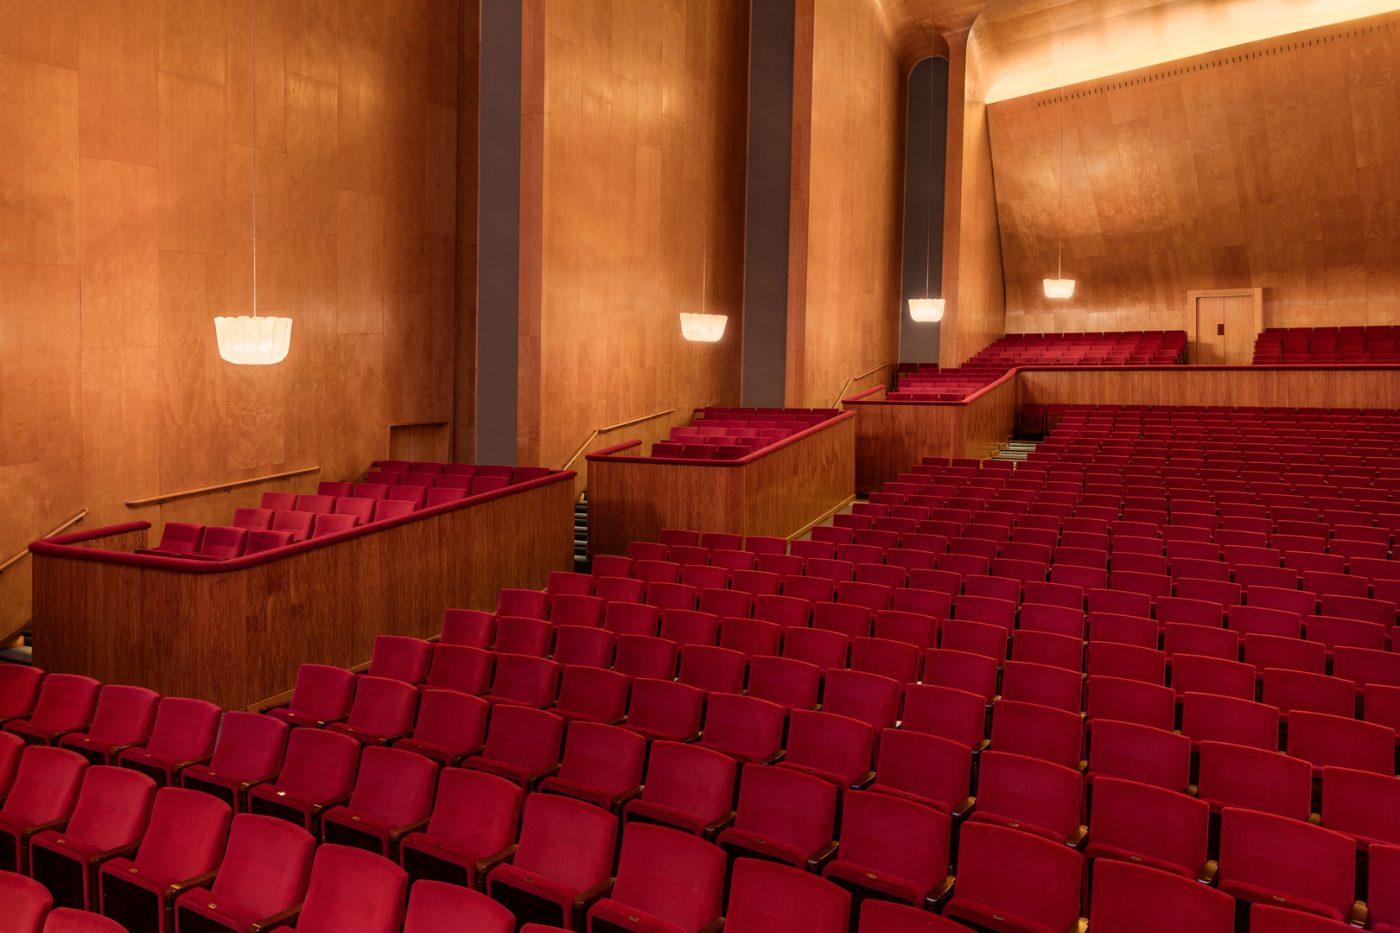 Göteborgs konserthus